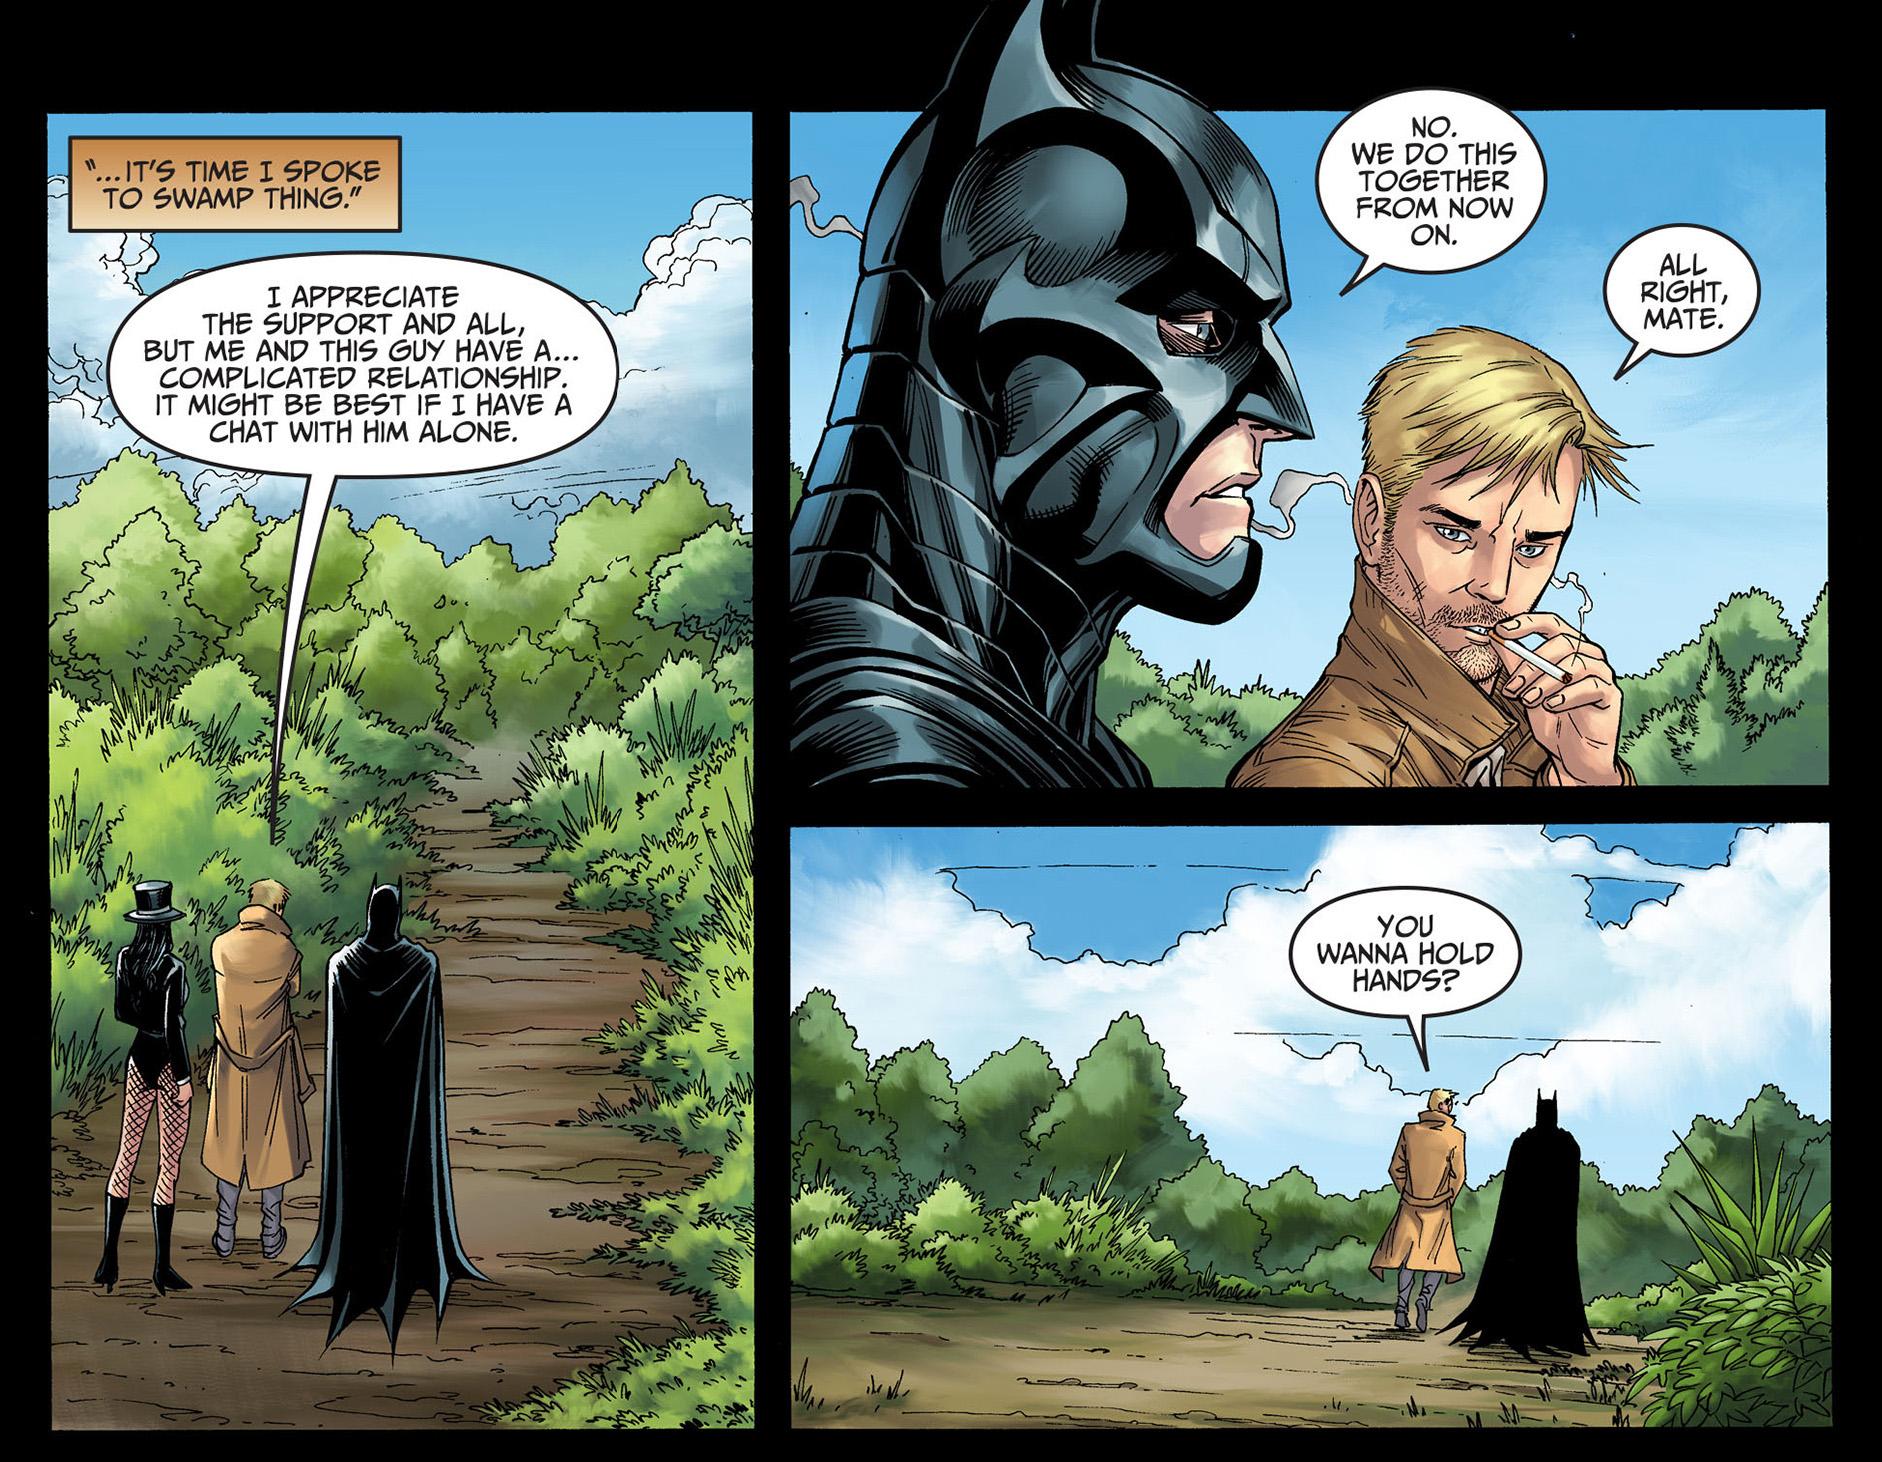 constantine wants to hold batman's hands